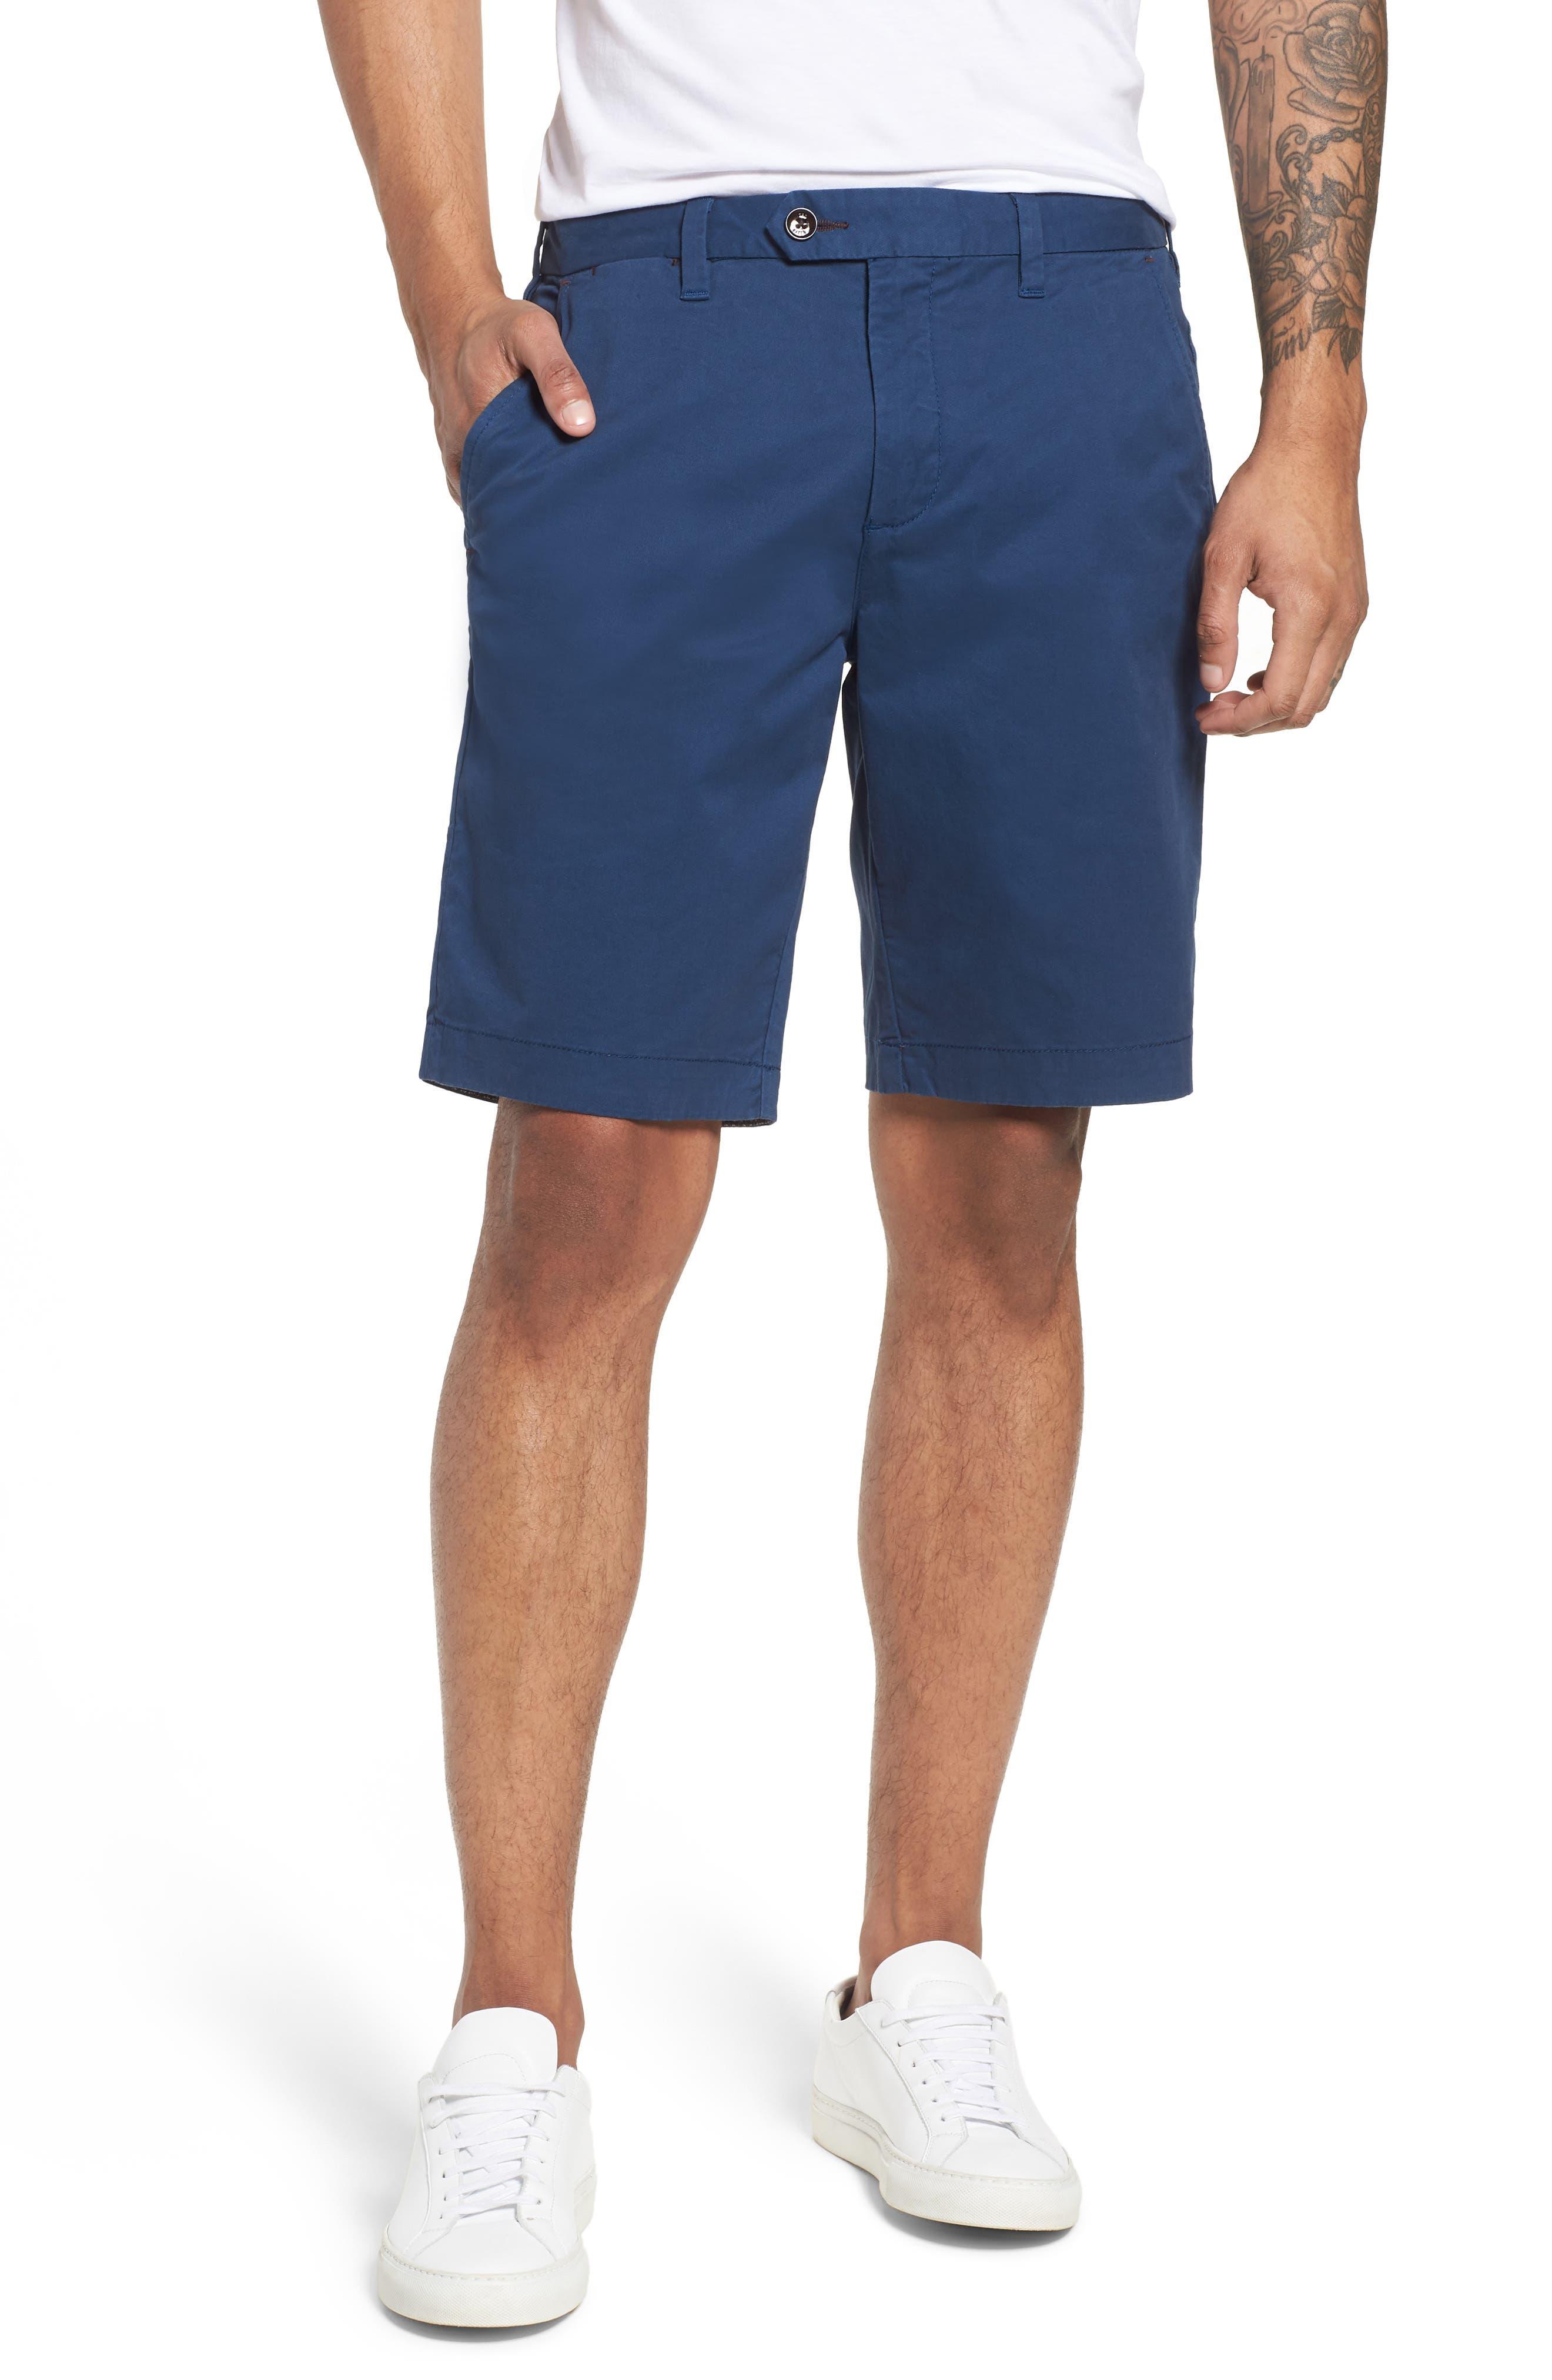 Ted Baker London Proshor Slim Fit Chino Shorts